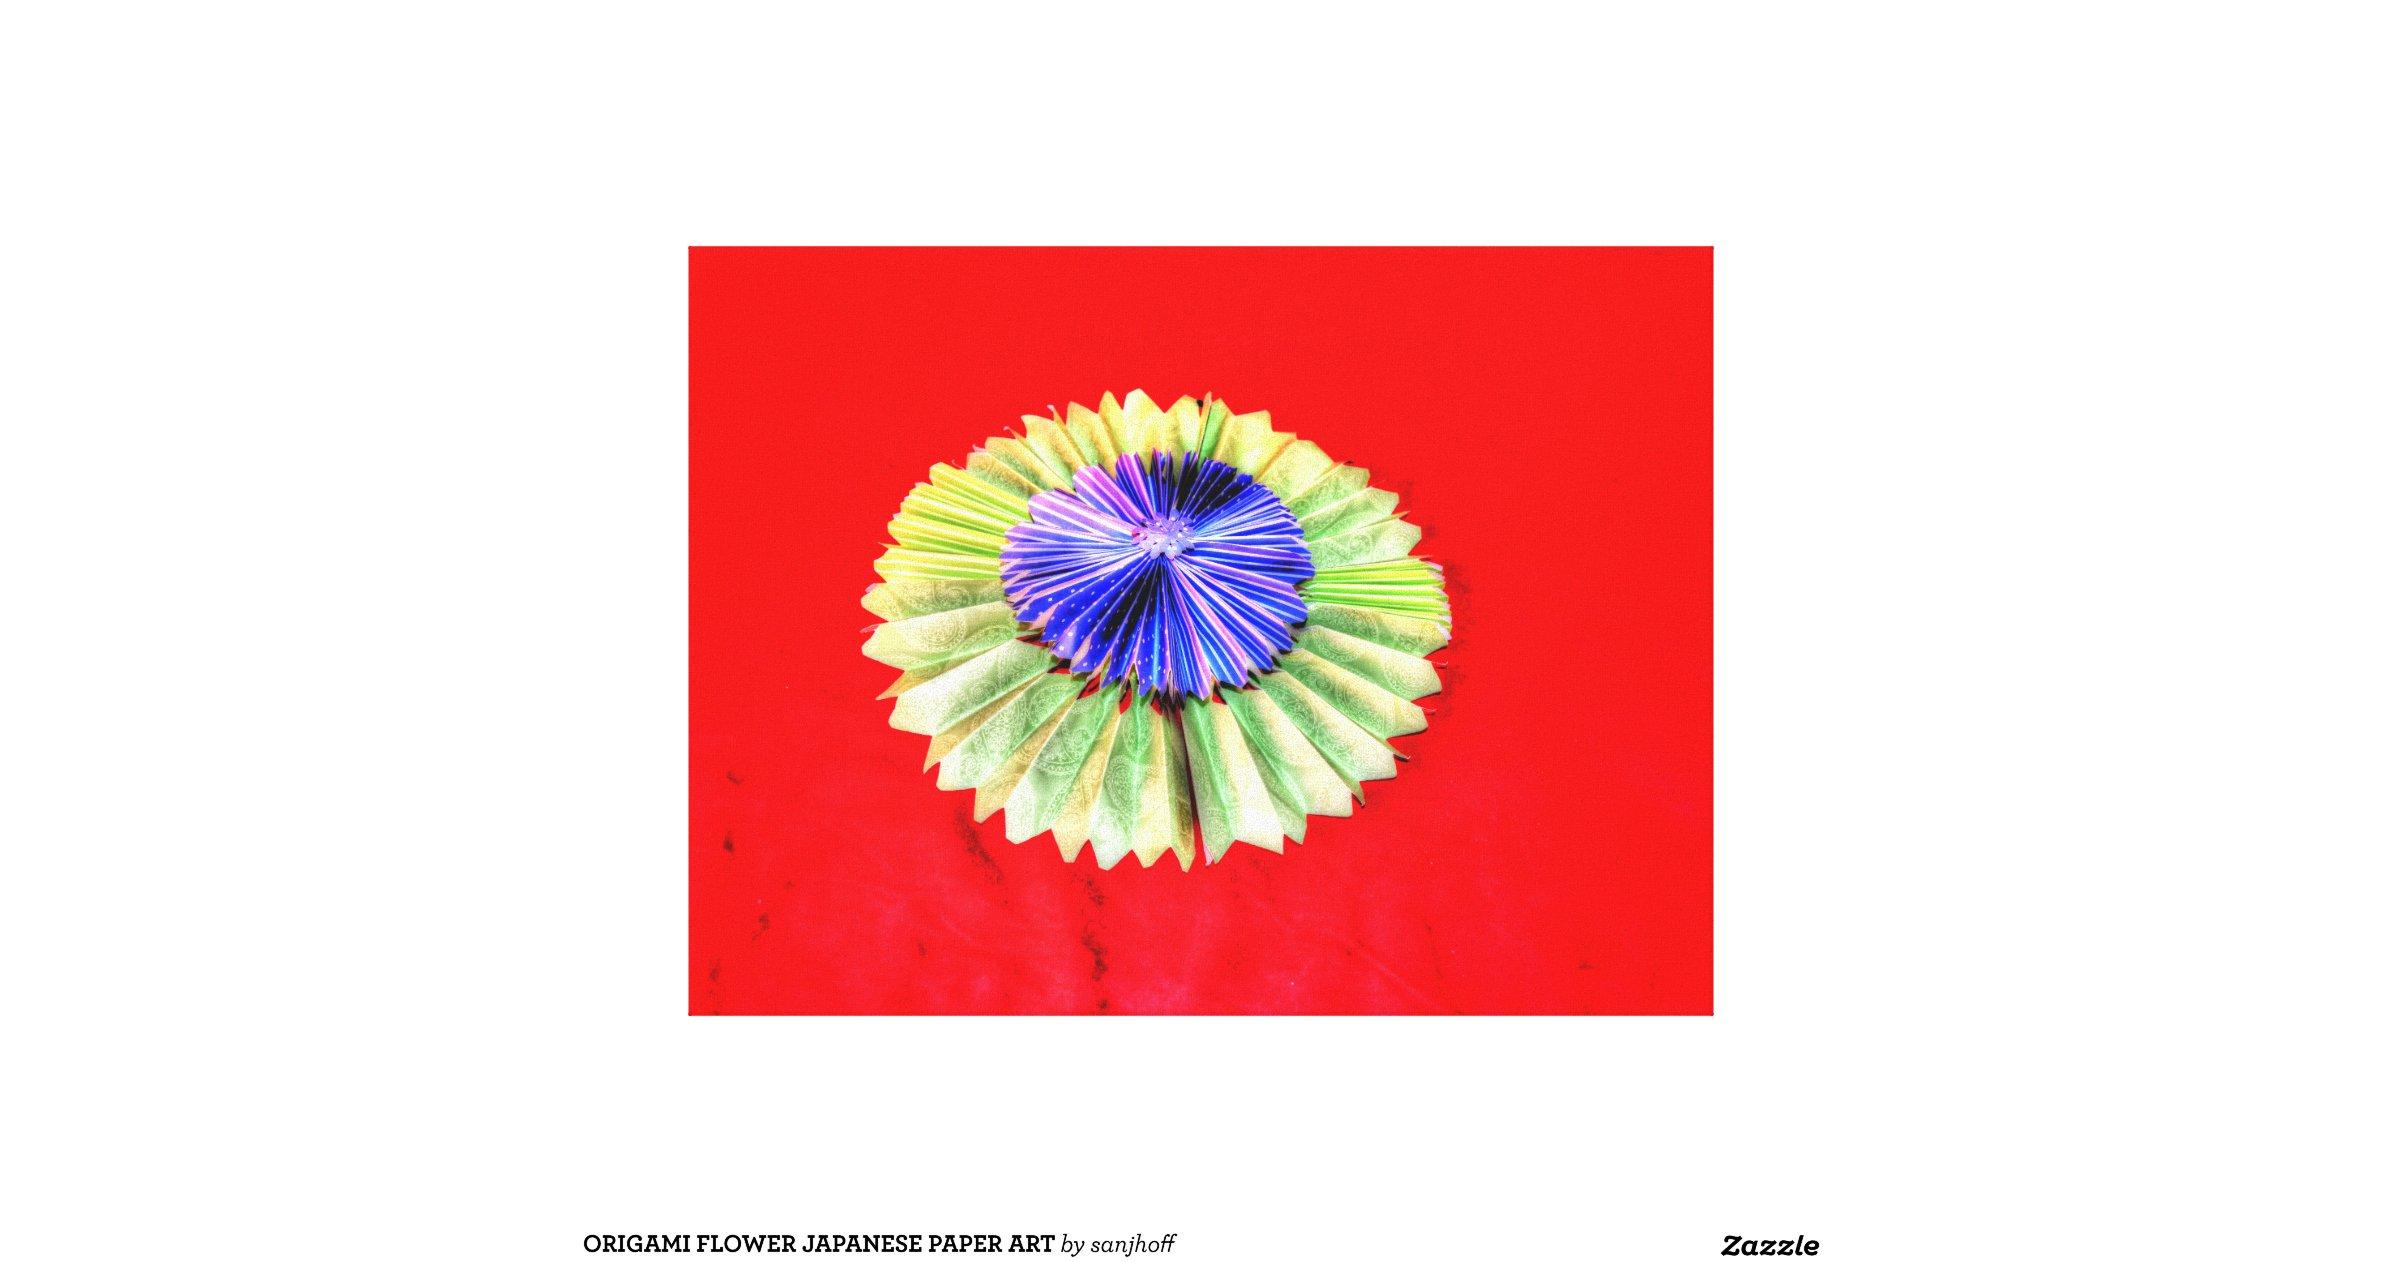 origami_flower_japanese_paper_art_canvas_print ... - photo#44